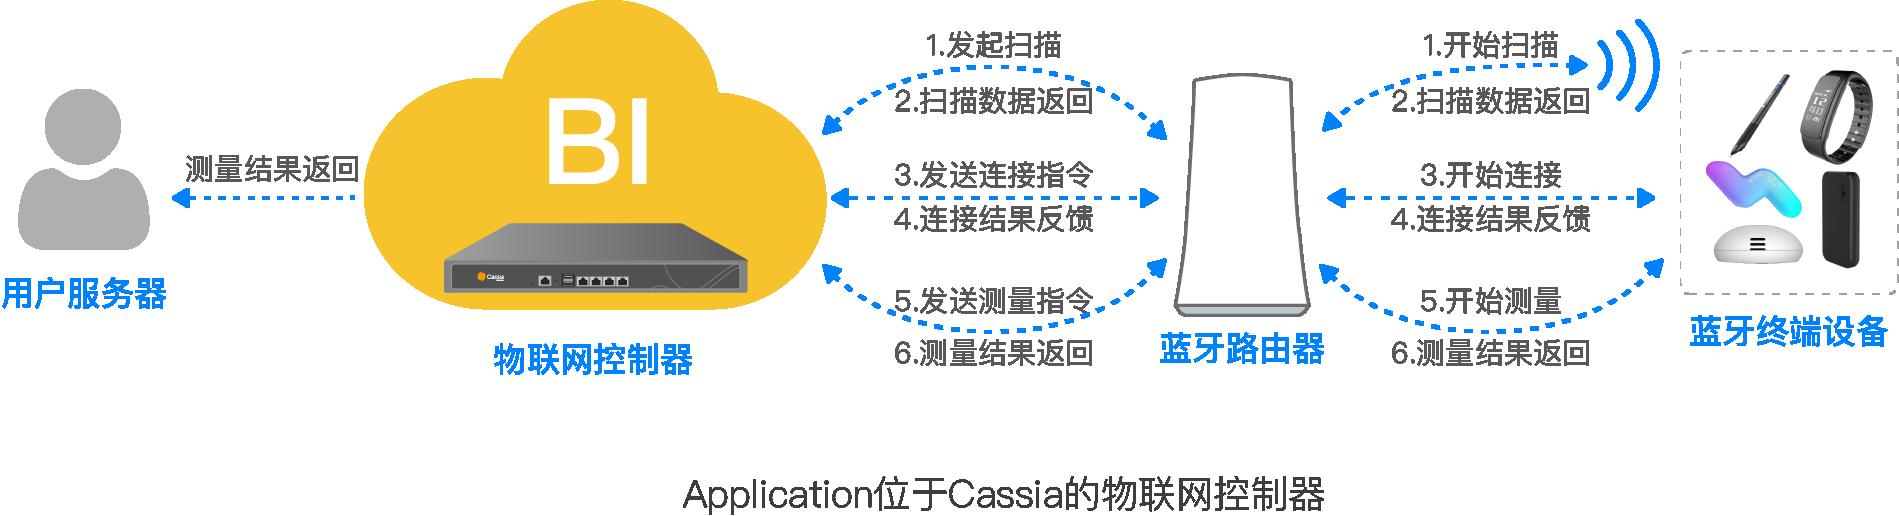 Application位于Cassia的物联网控制器中